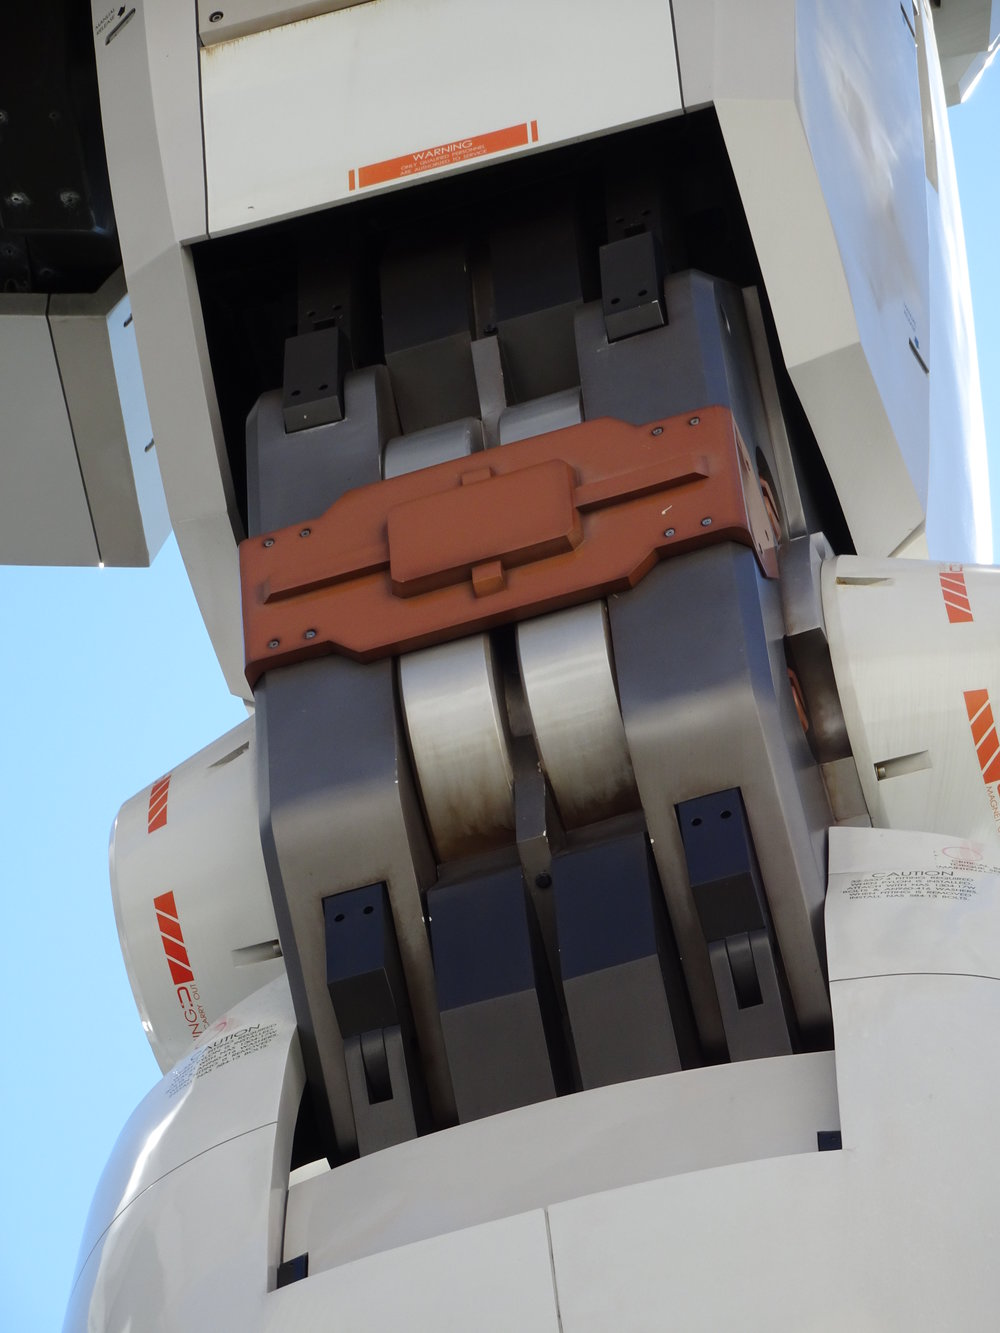 RX-78-2 Gundam 1-1 Statue - 051.jpg